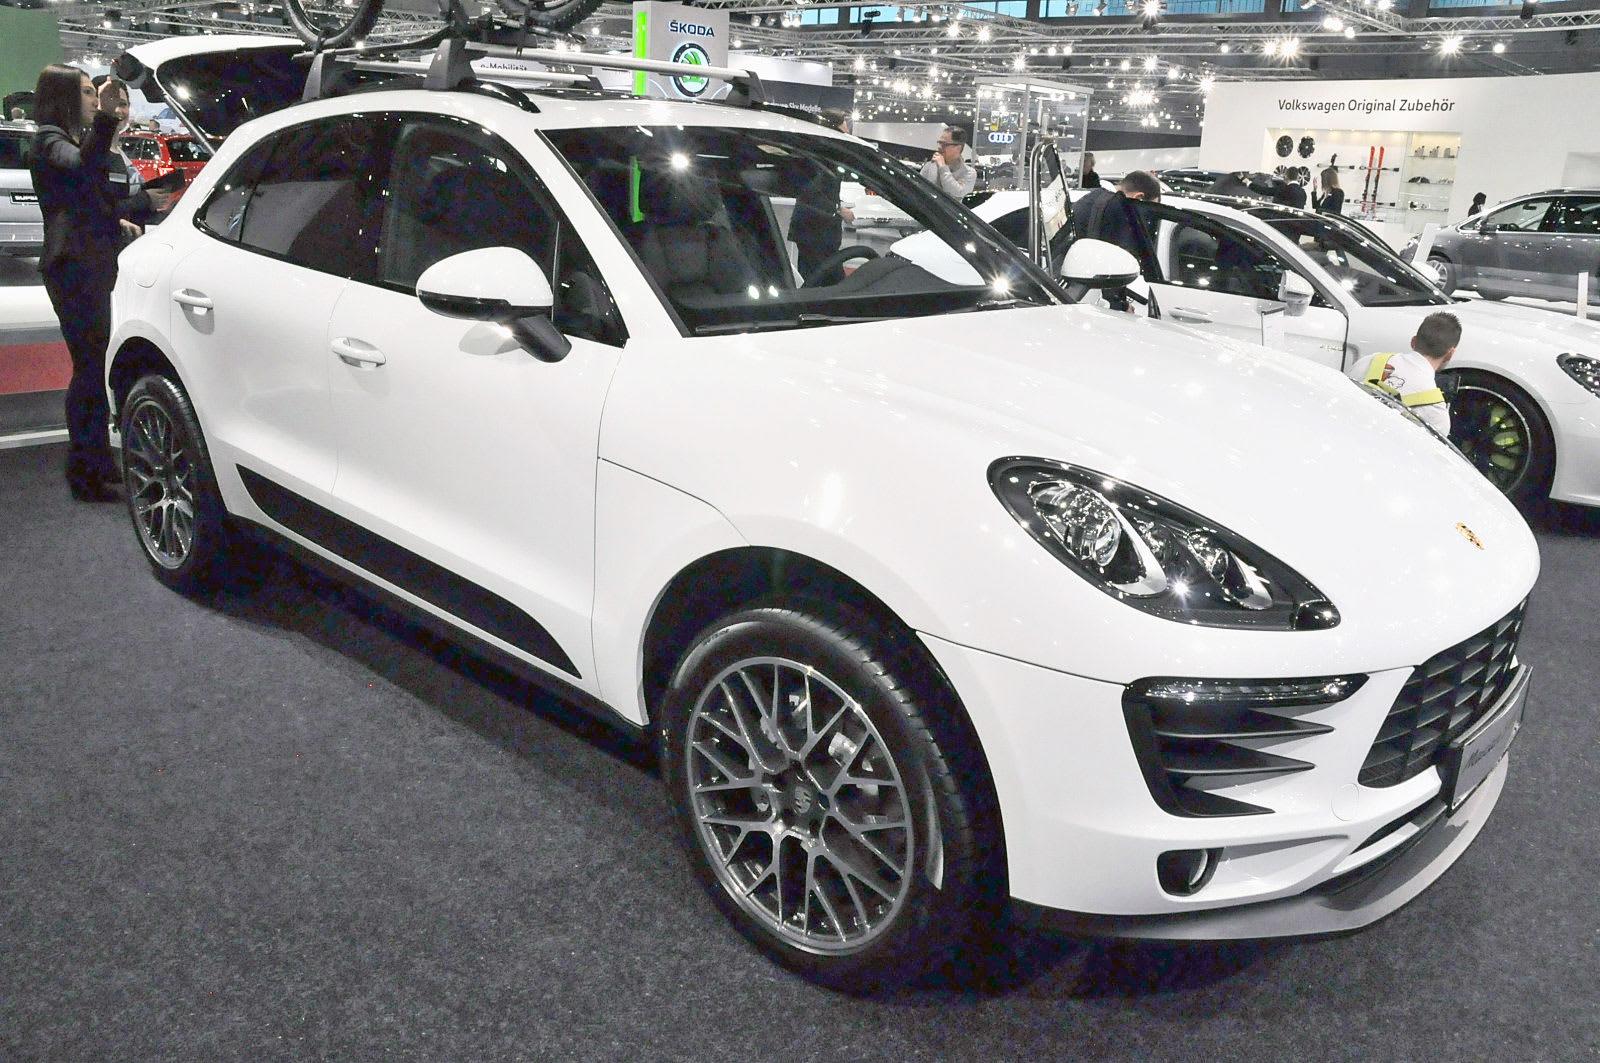 Porsche is the first German car maker to drop diesel